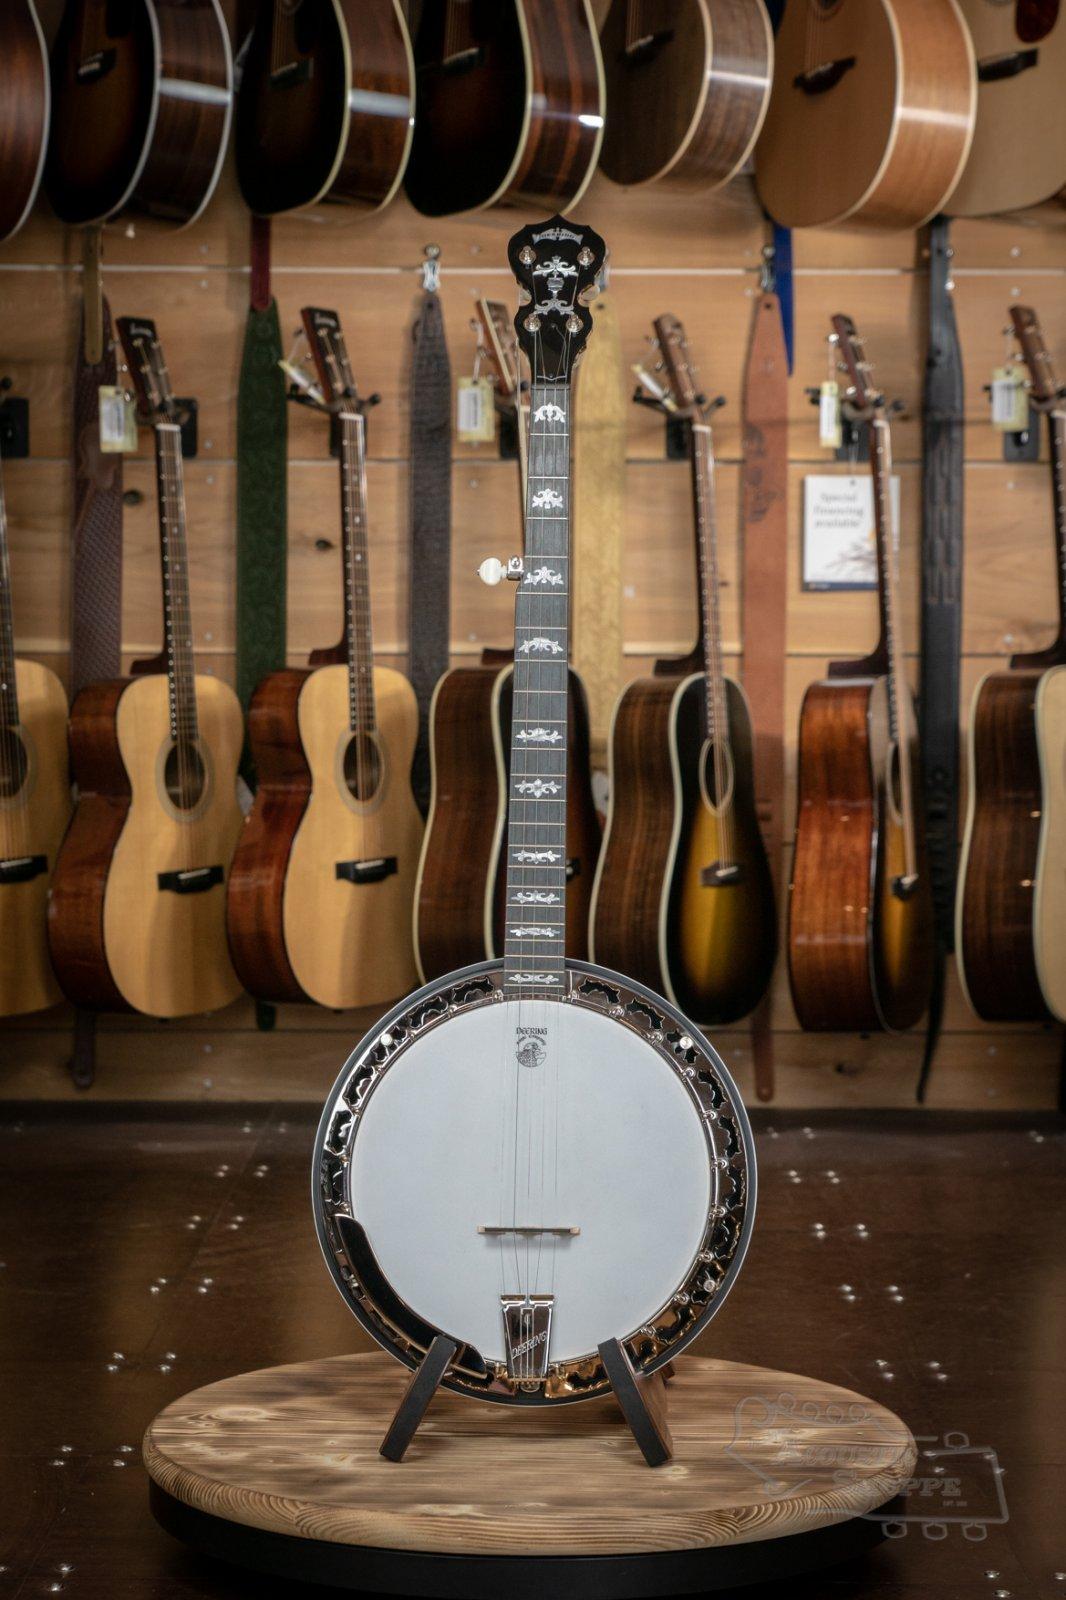 Deering Eagle II 5 String Banjo #1317